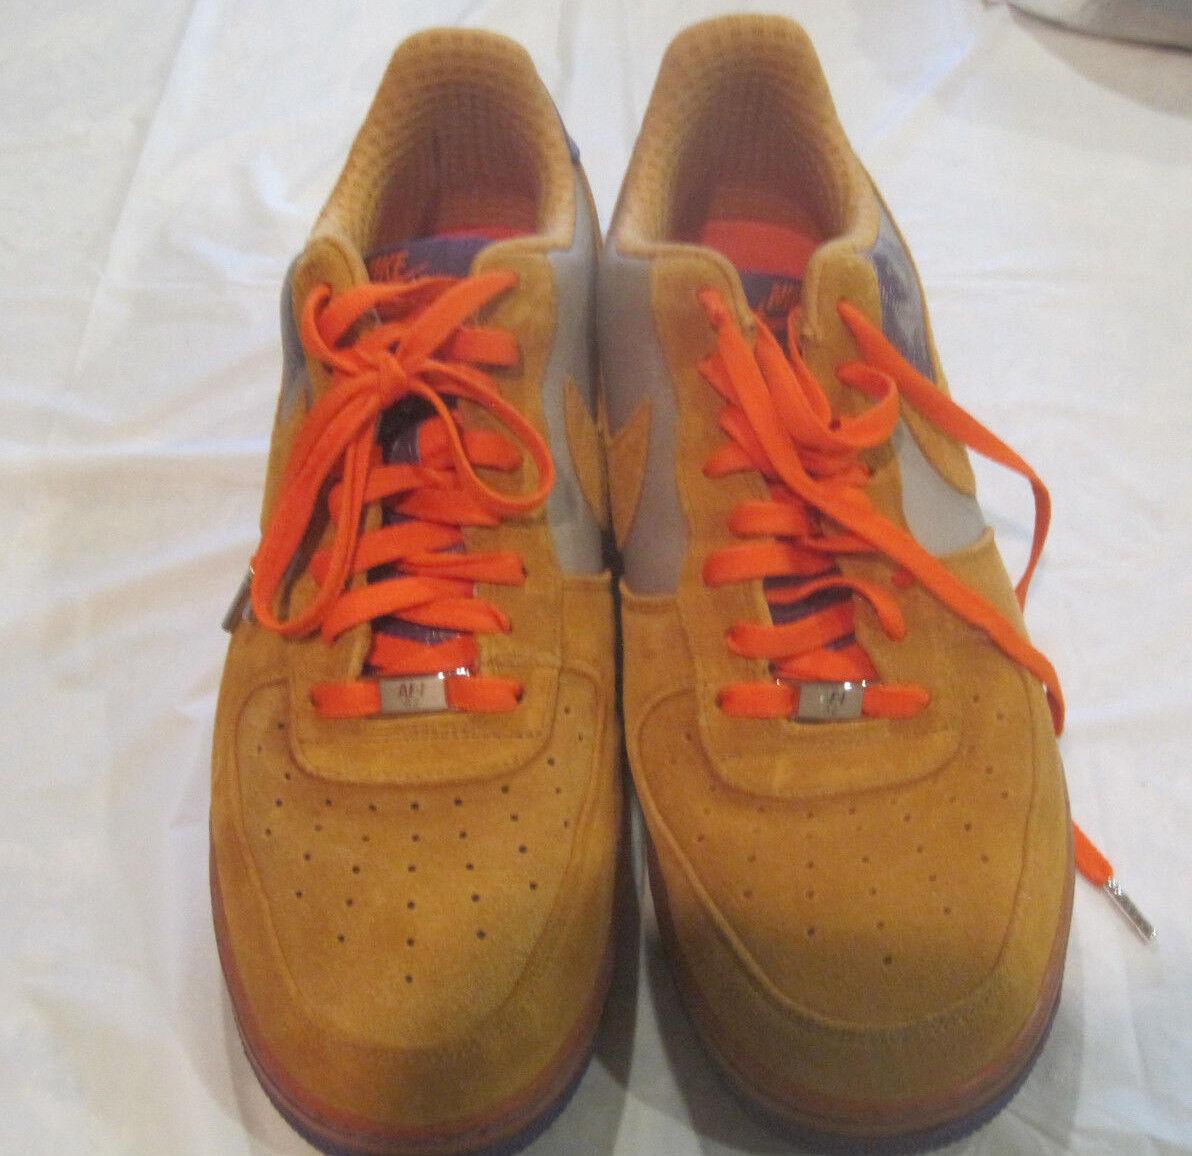 Nike Air Force 1 Amare Stoudemire 315182-071~Mens Shoe Size 13 US~LBDLK